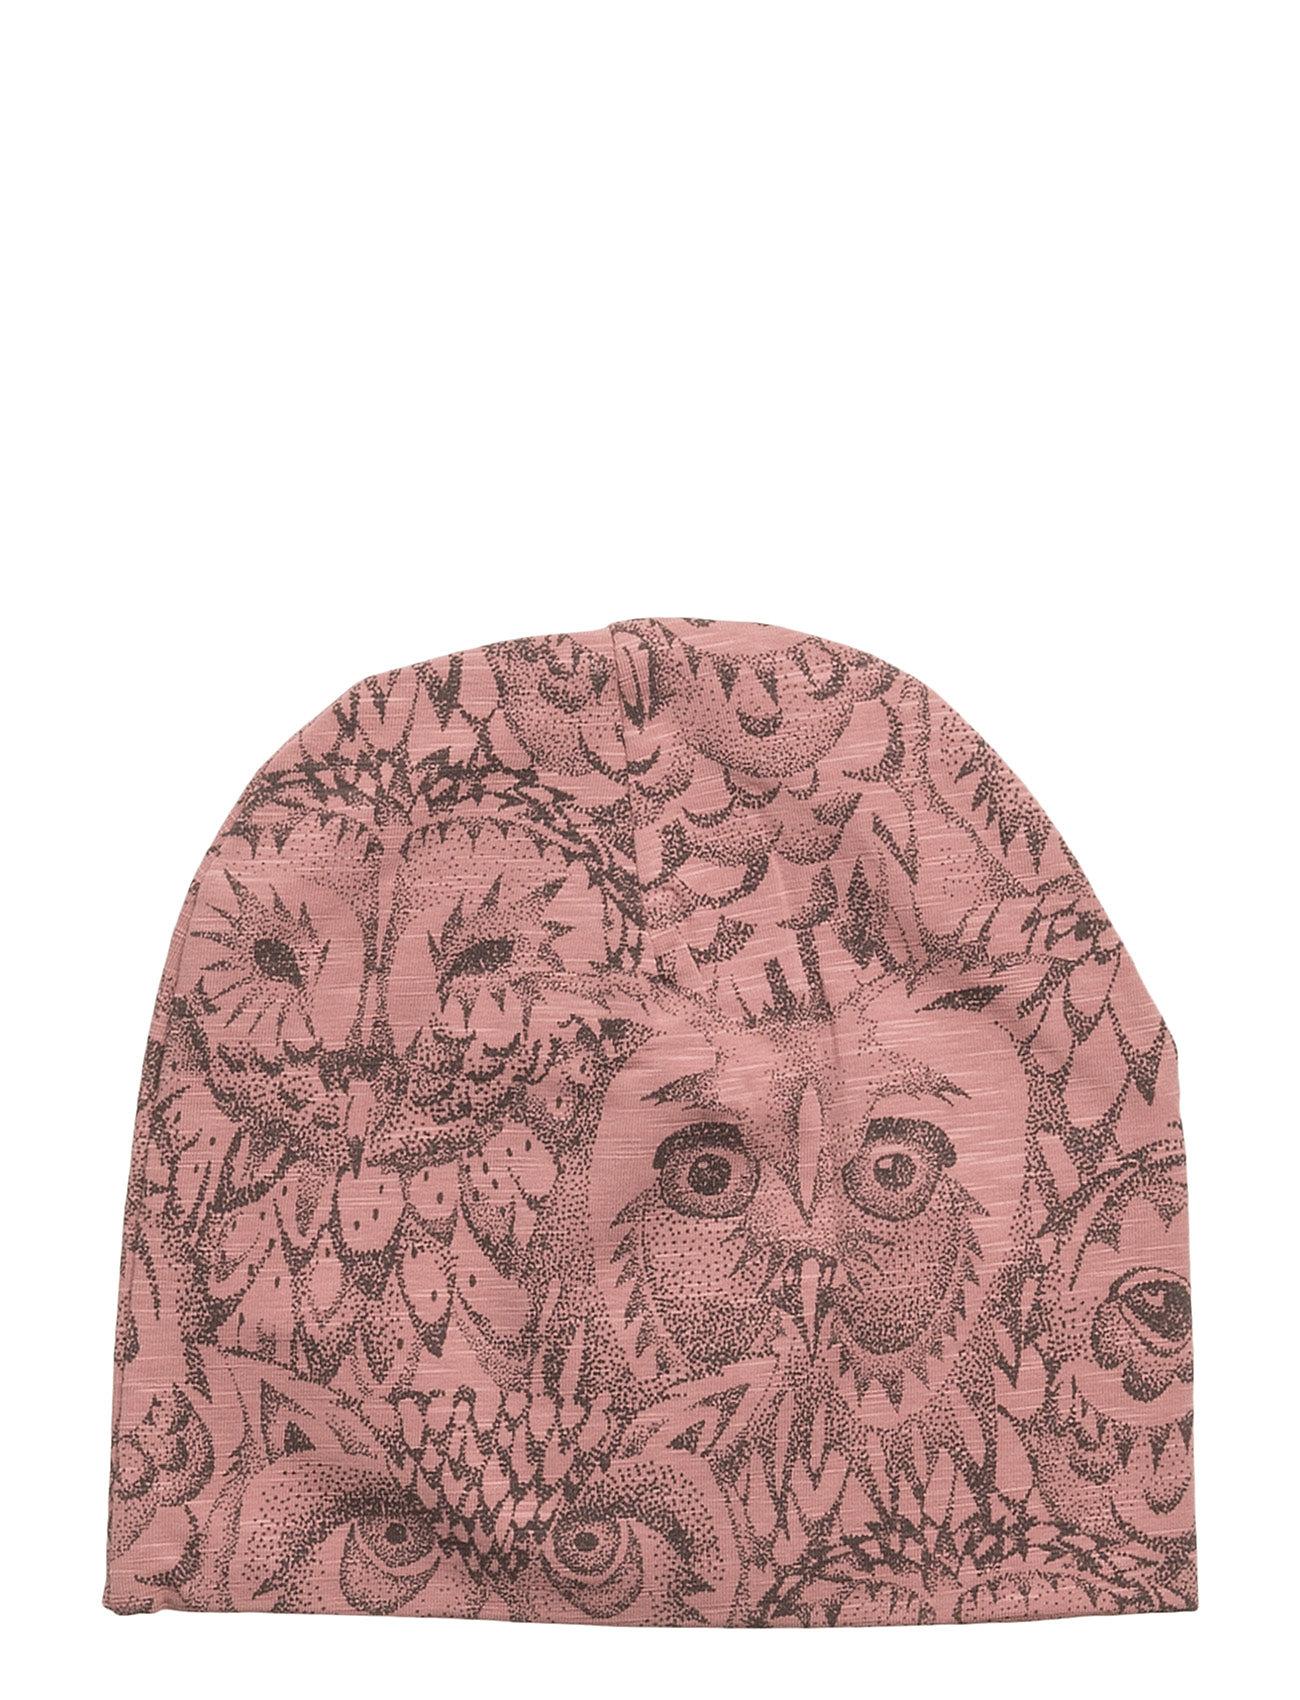 Soft Gallery Beanie - BURLWOOD, AOP OWL